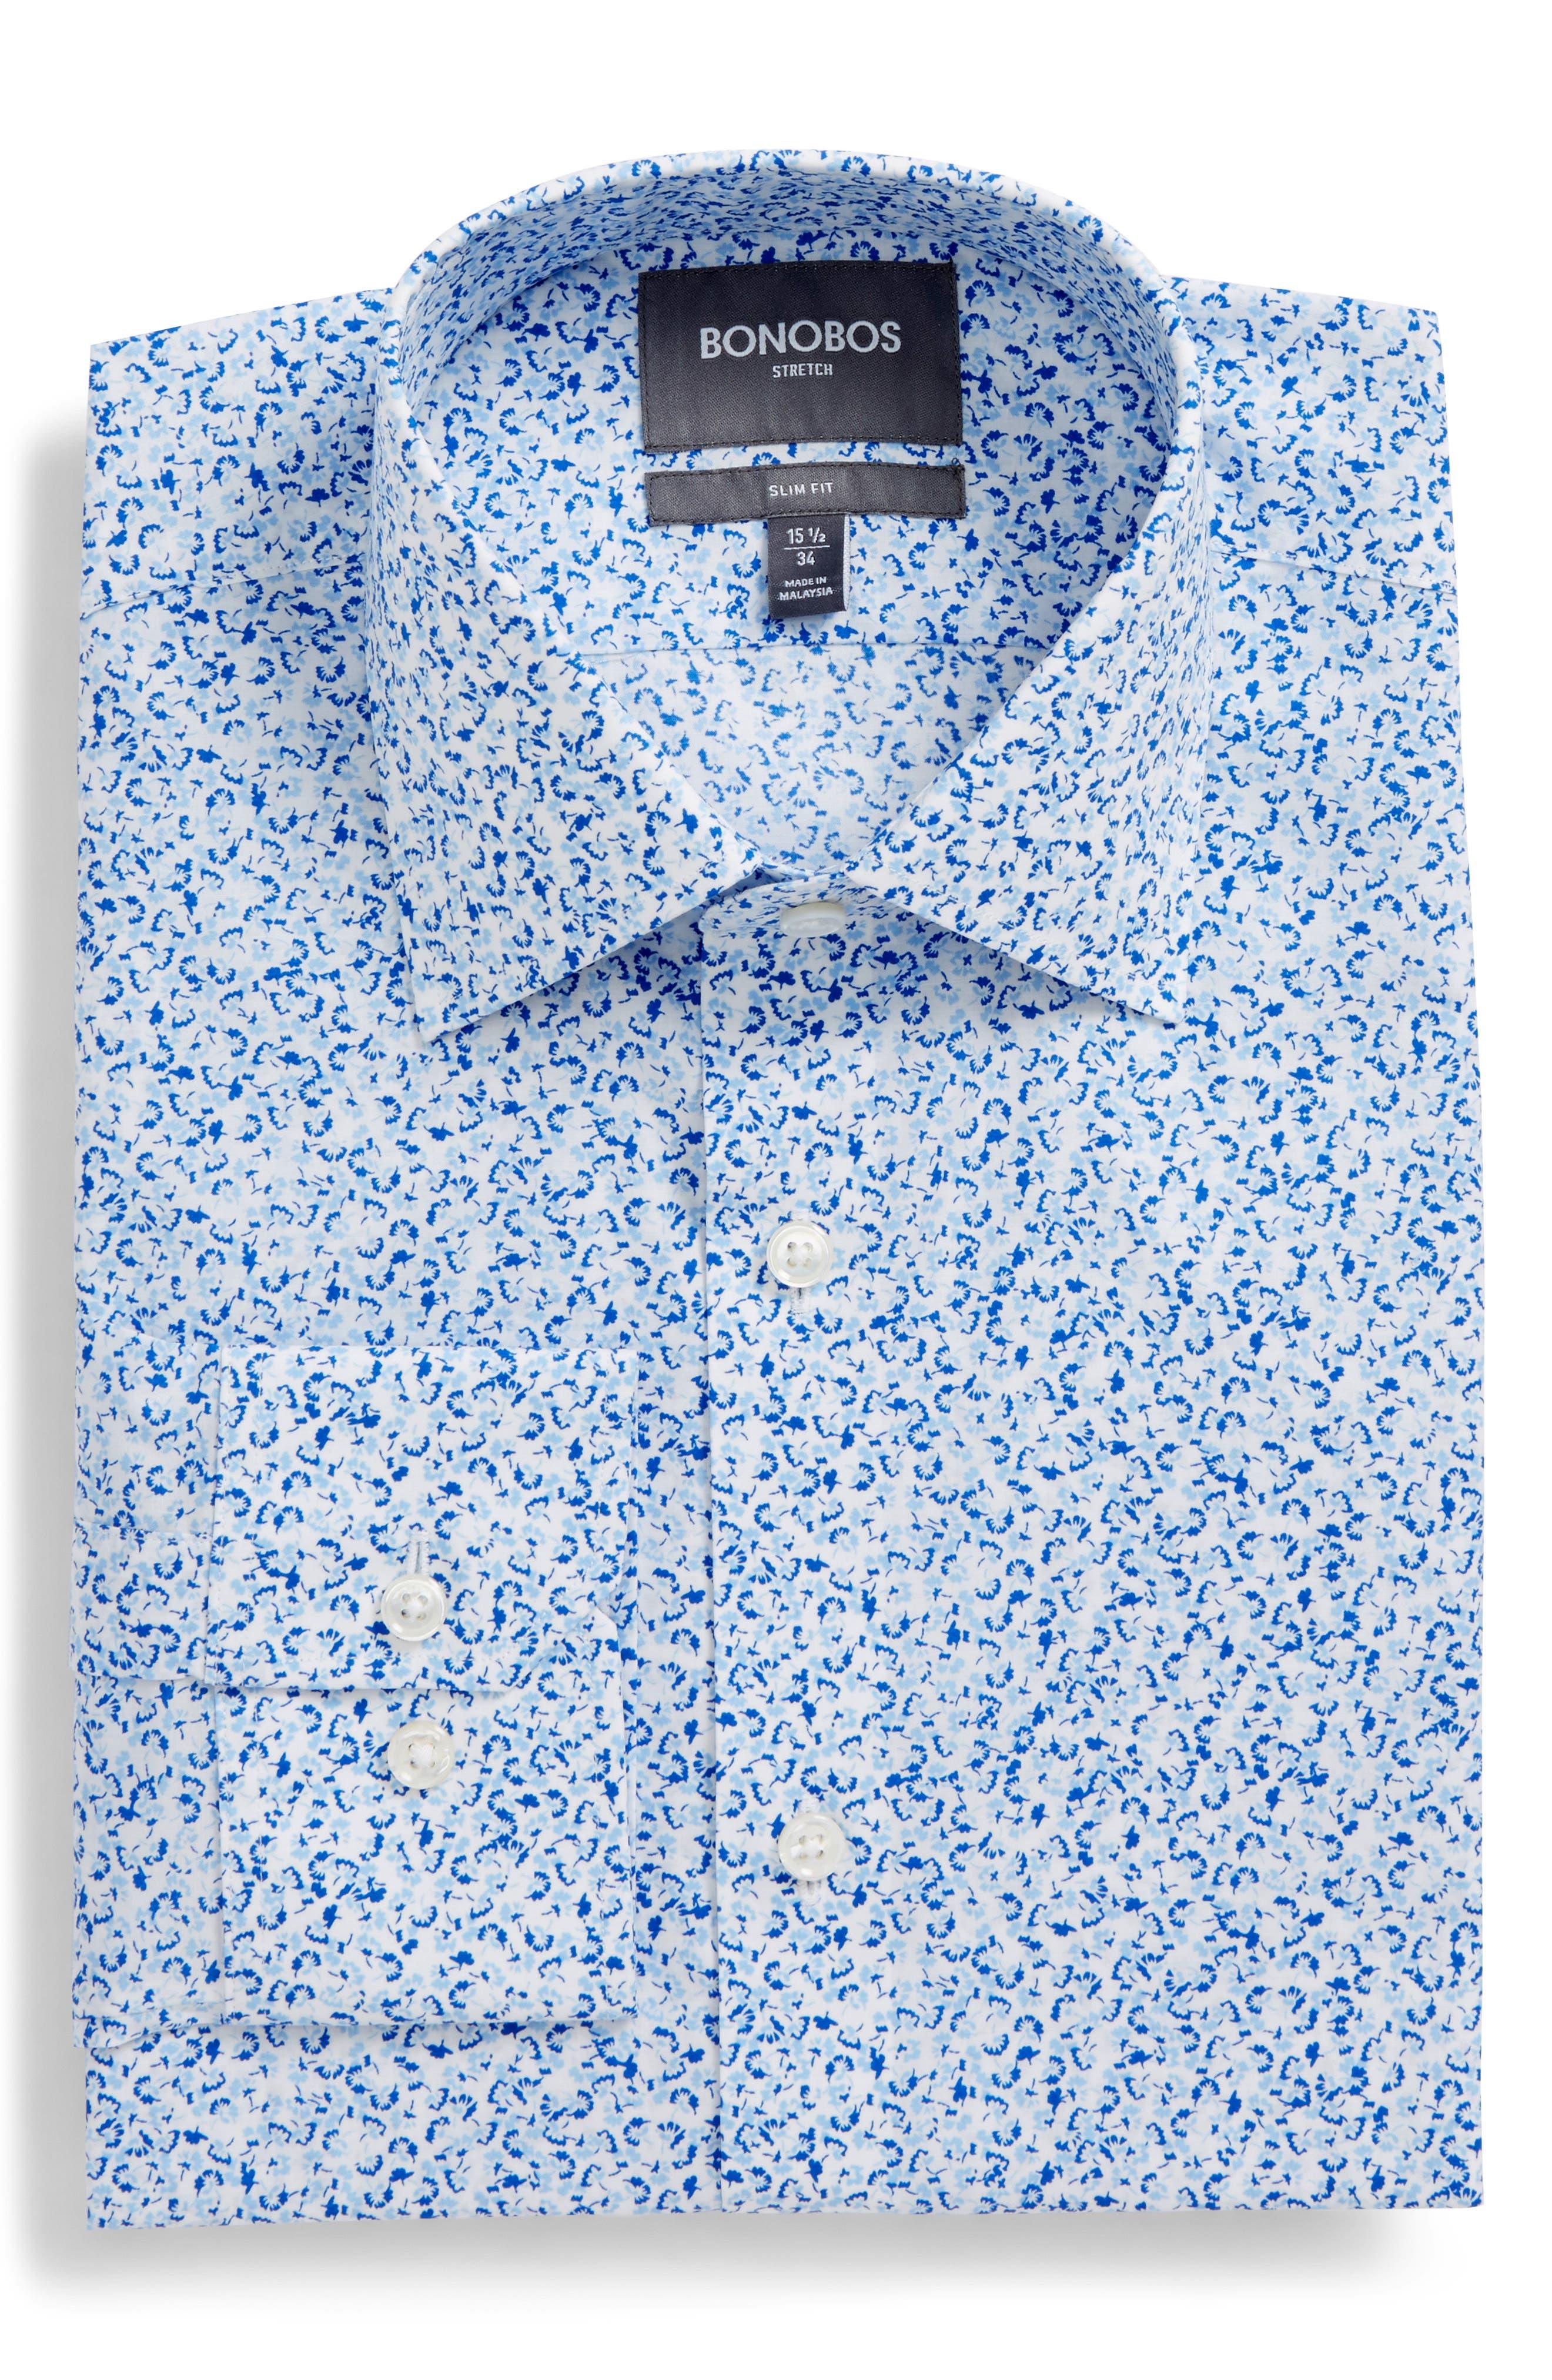 Jetsetter Slim Fit Floral Dress Shirt,                             Alternate thumbnail 5, color,                             400